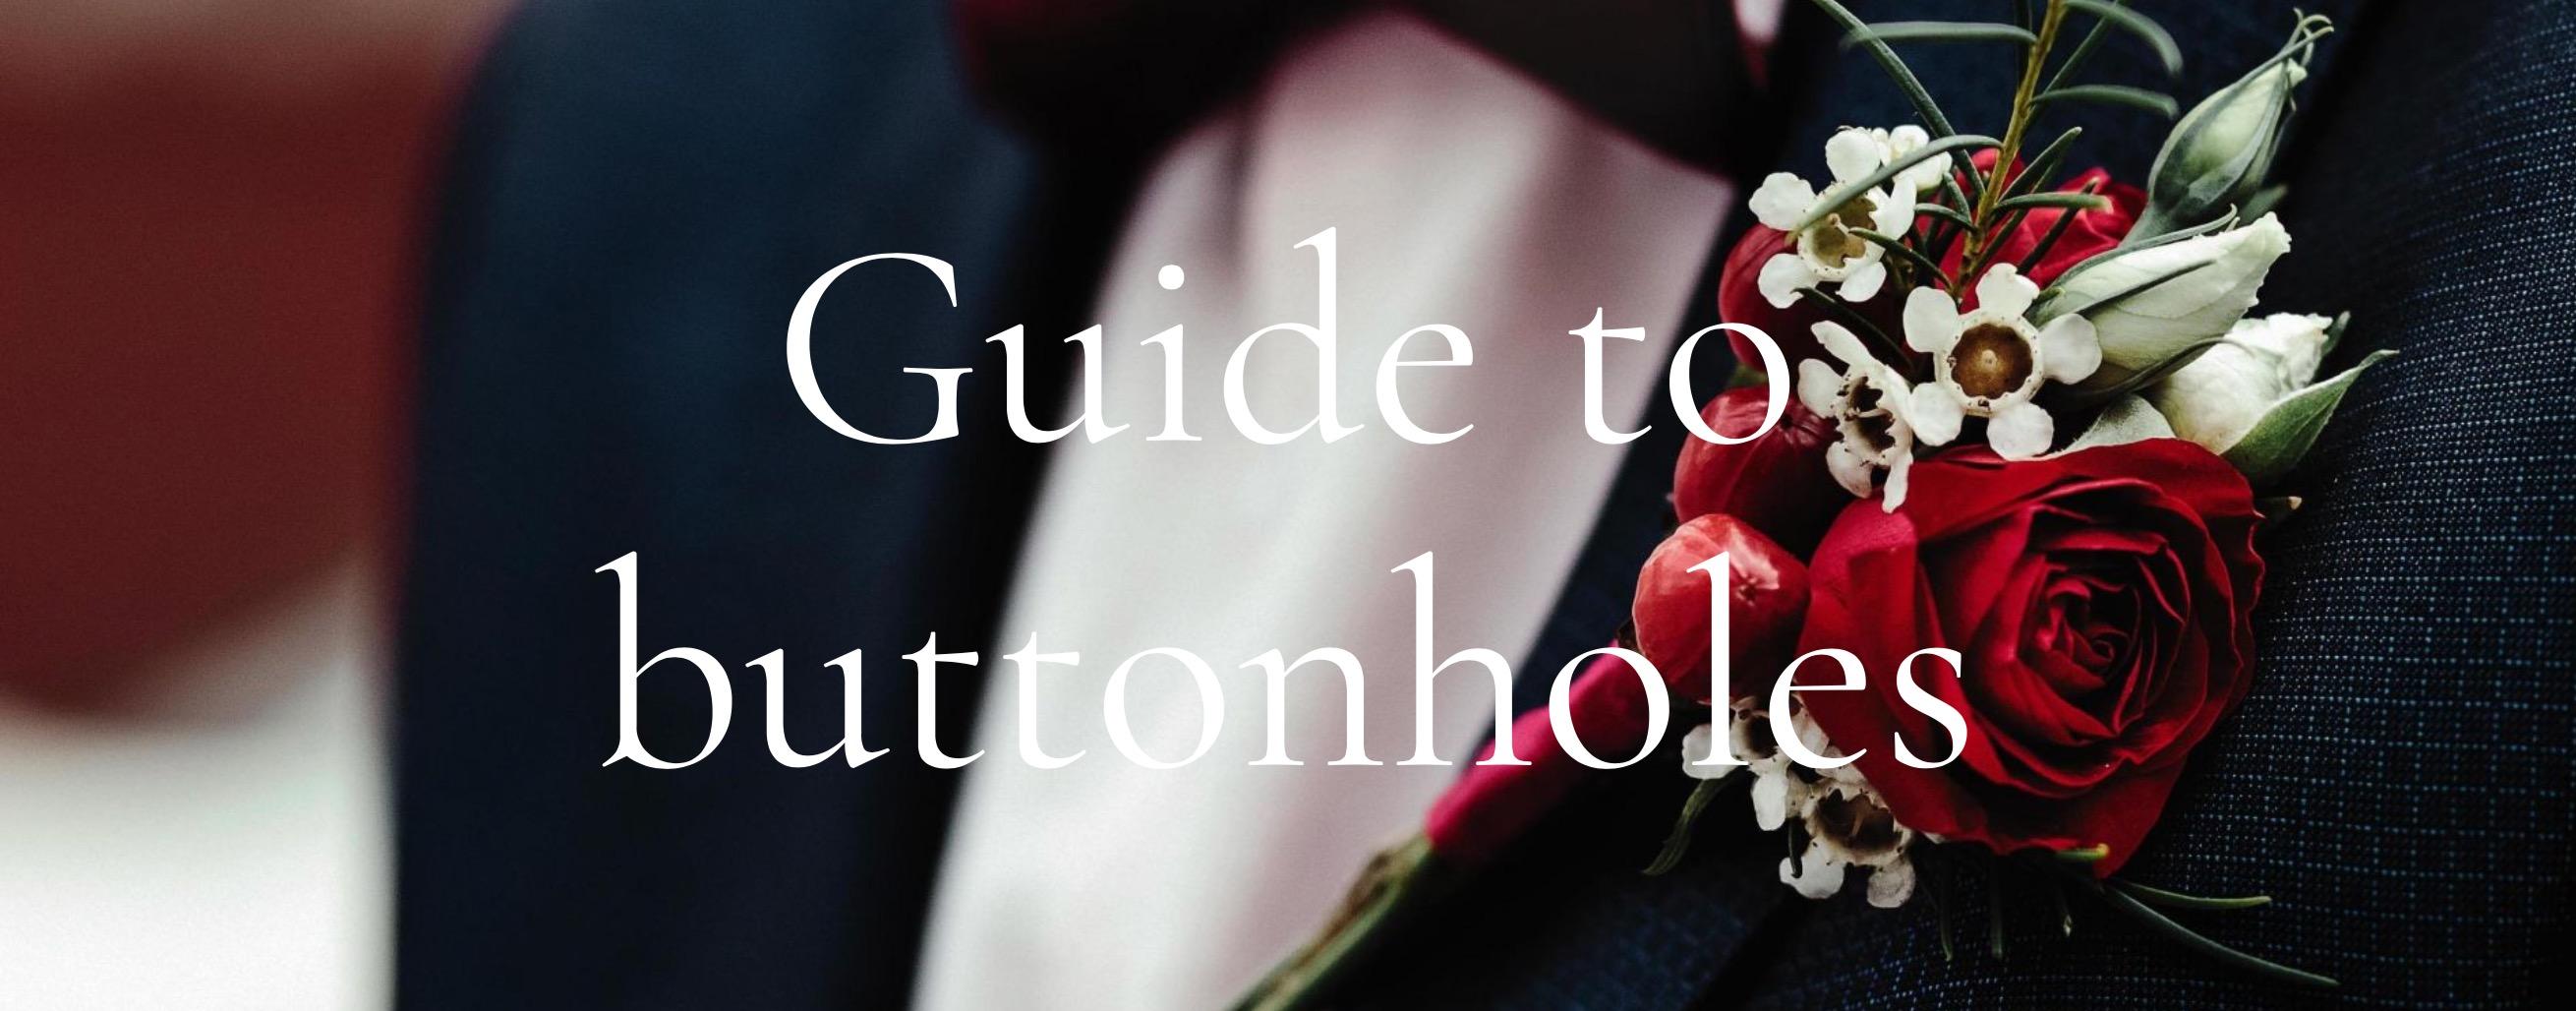 The Royal Butler Guide